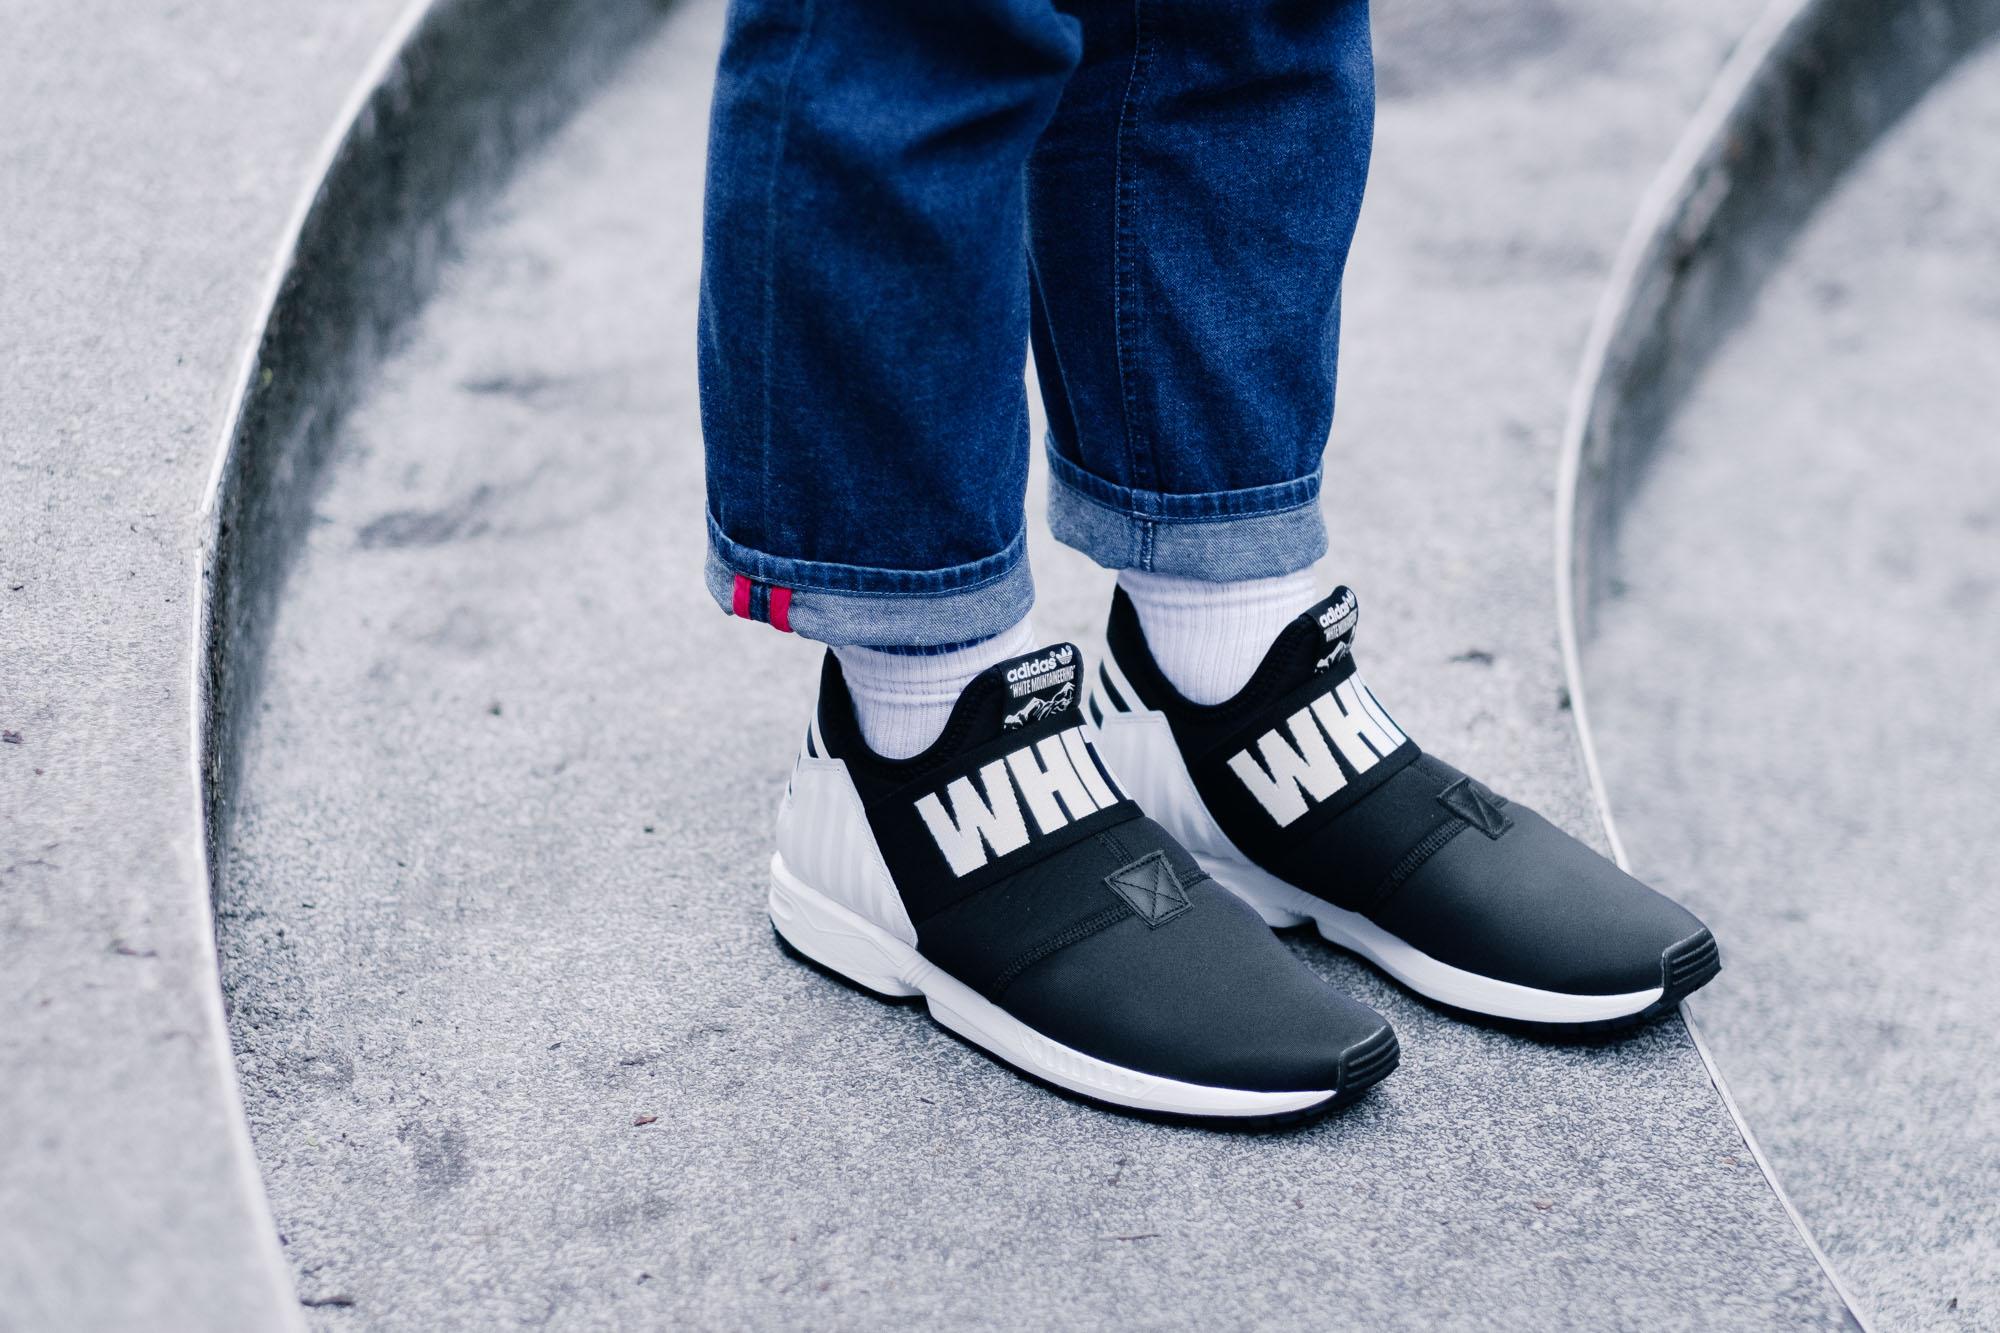 50f06a2fdff8 adidas-originals-x-white-mountaineering-zx-flux-plus-01 – KEEDAN.COM